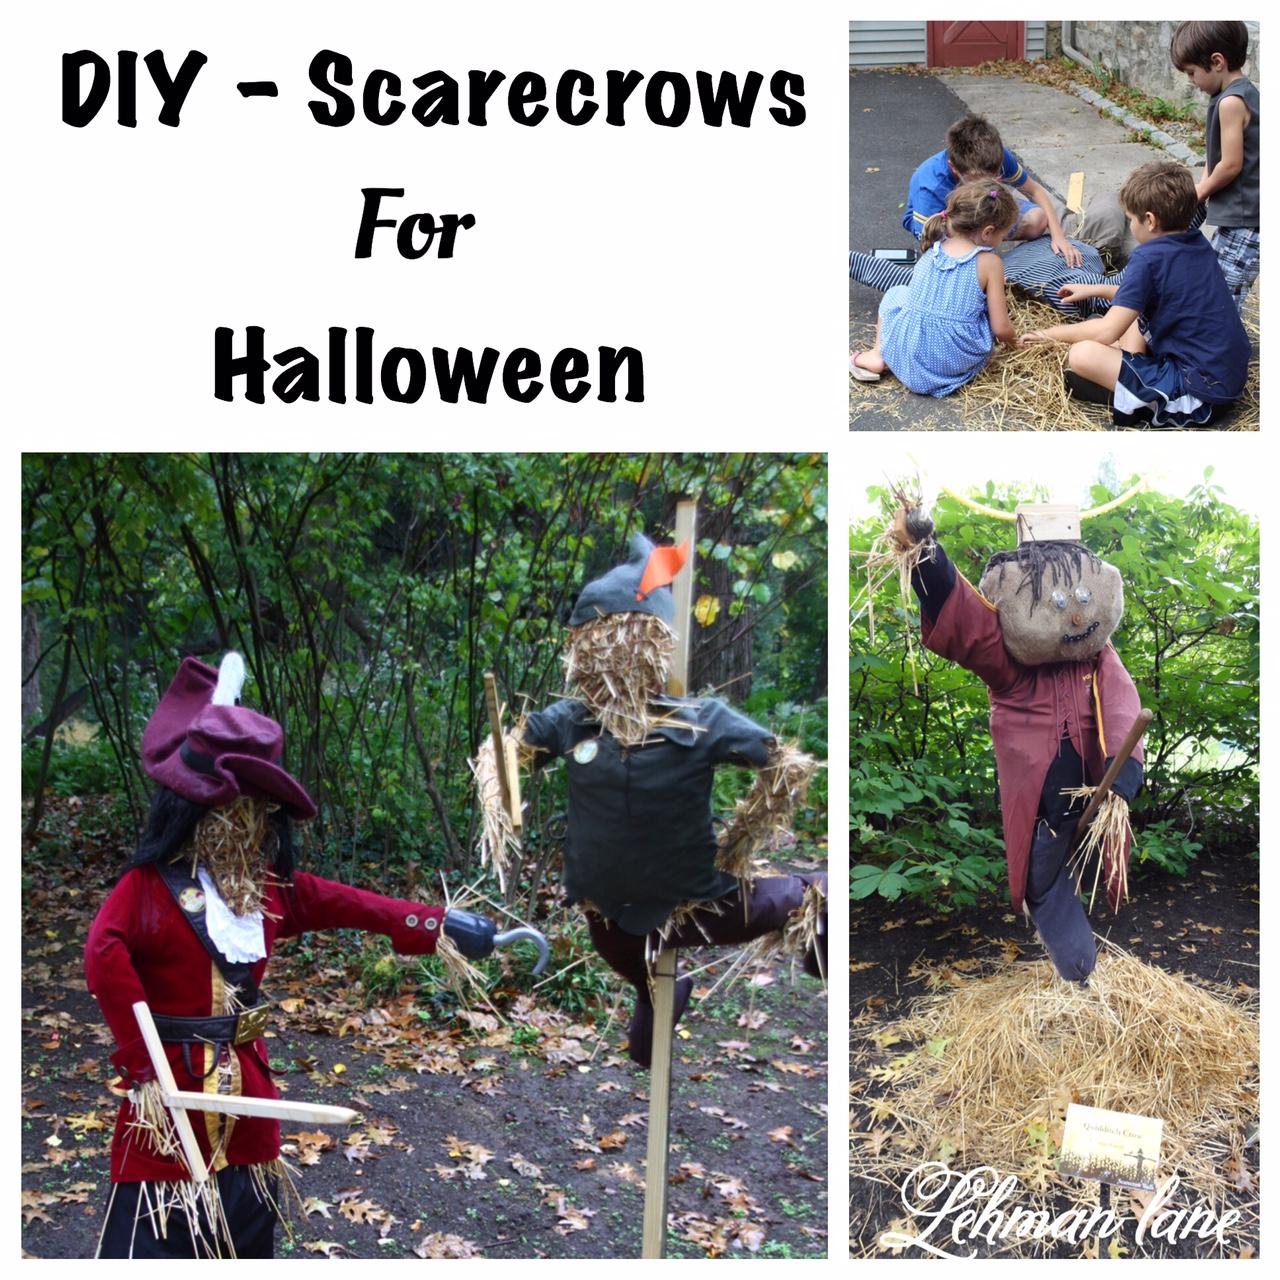 DIY - Scarecrows for Halloween